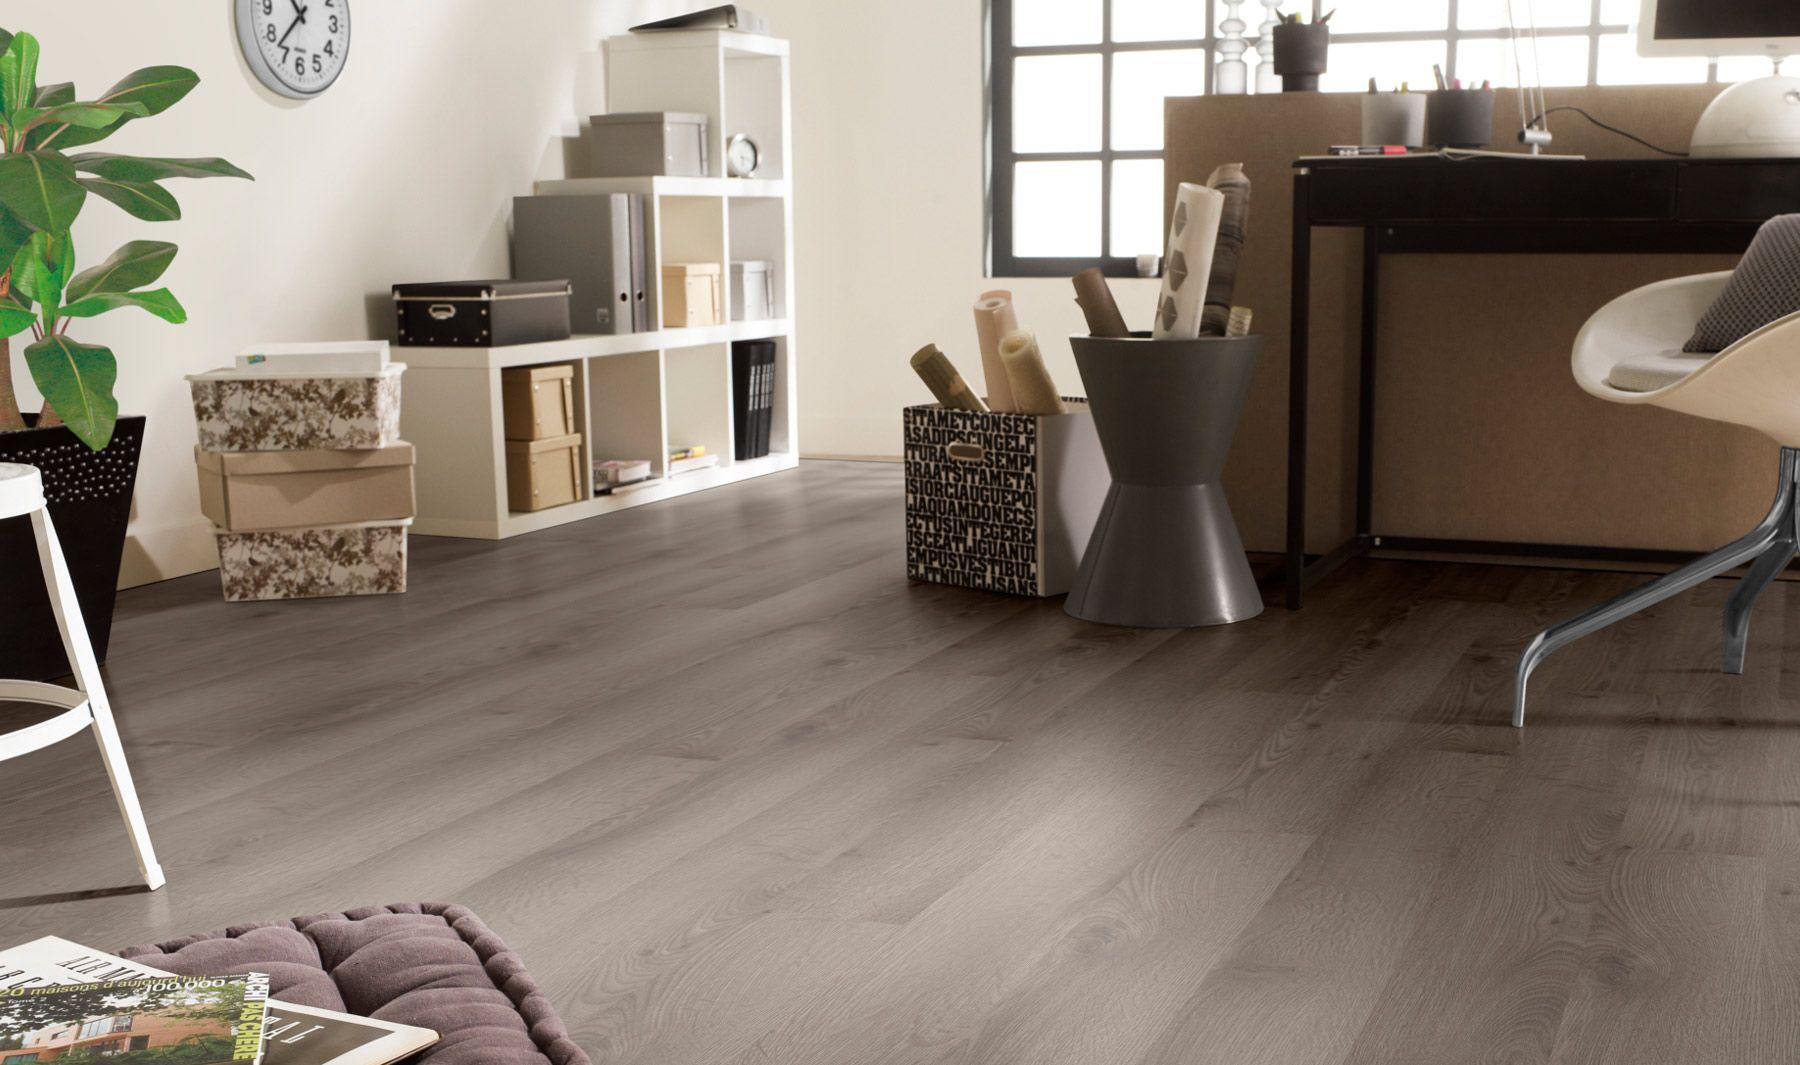 tarkett diversia roble plank gris decoracin suelo laminado gris buscar con google - Suelo Laminado Gris